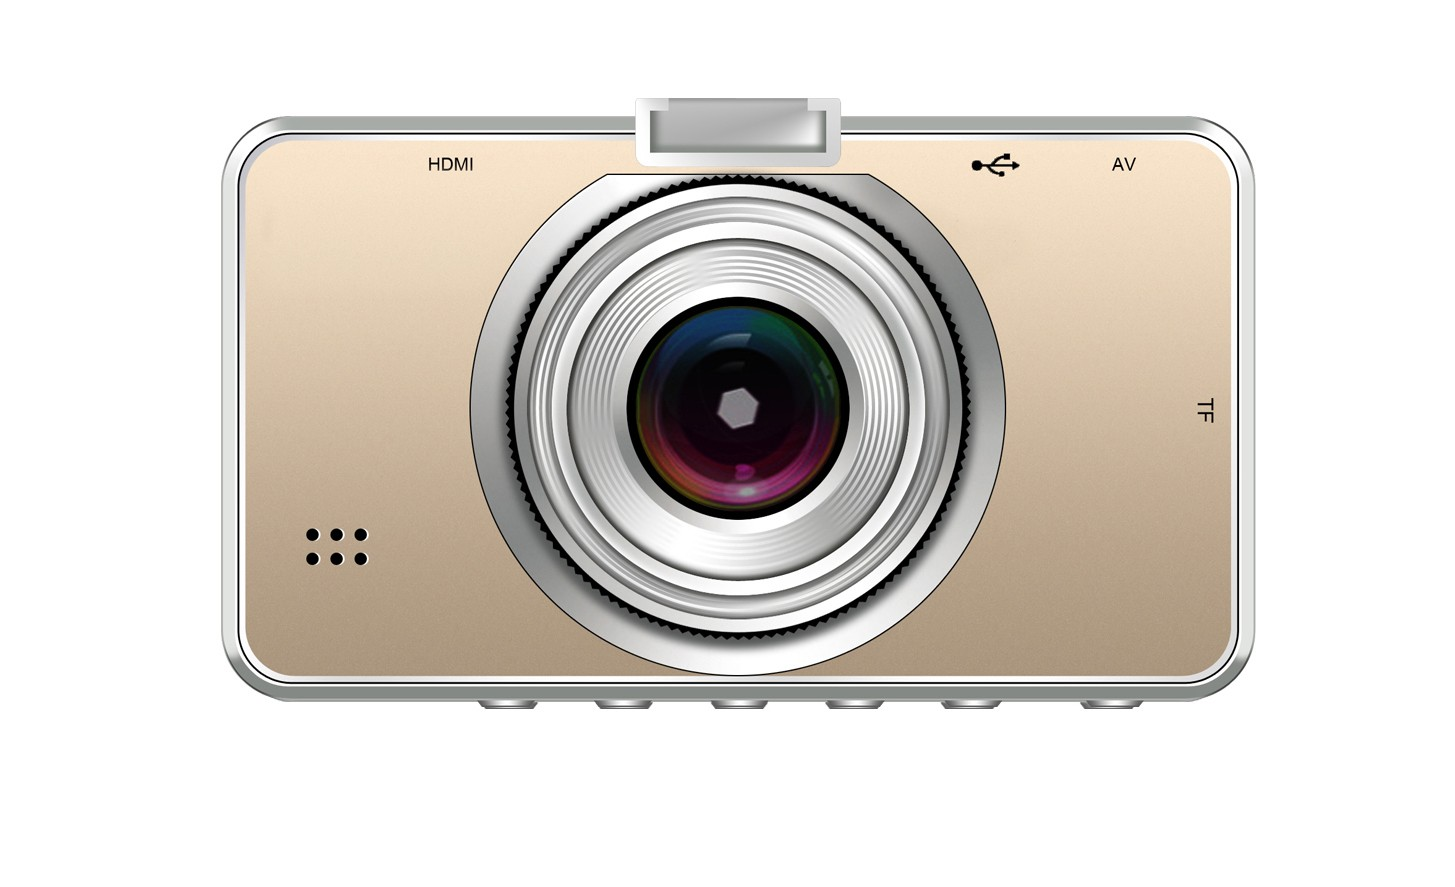 Camera Vido Auto Novatek T601 FullHD 12MPx Slim